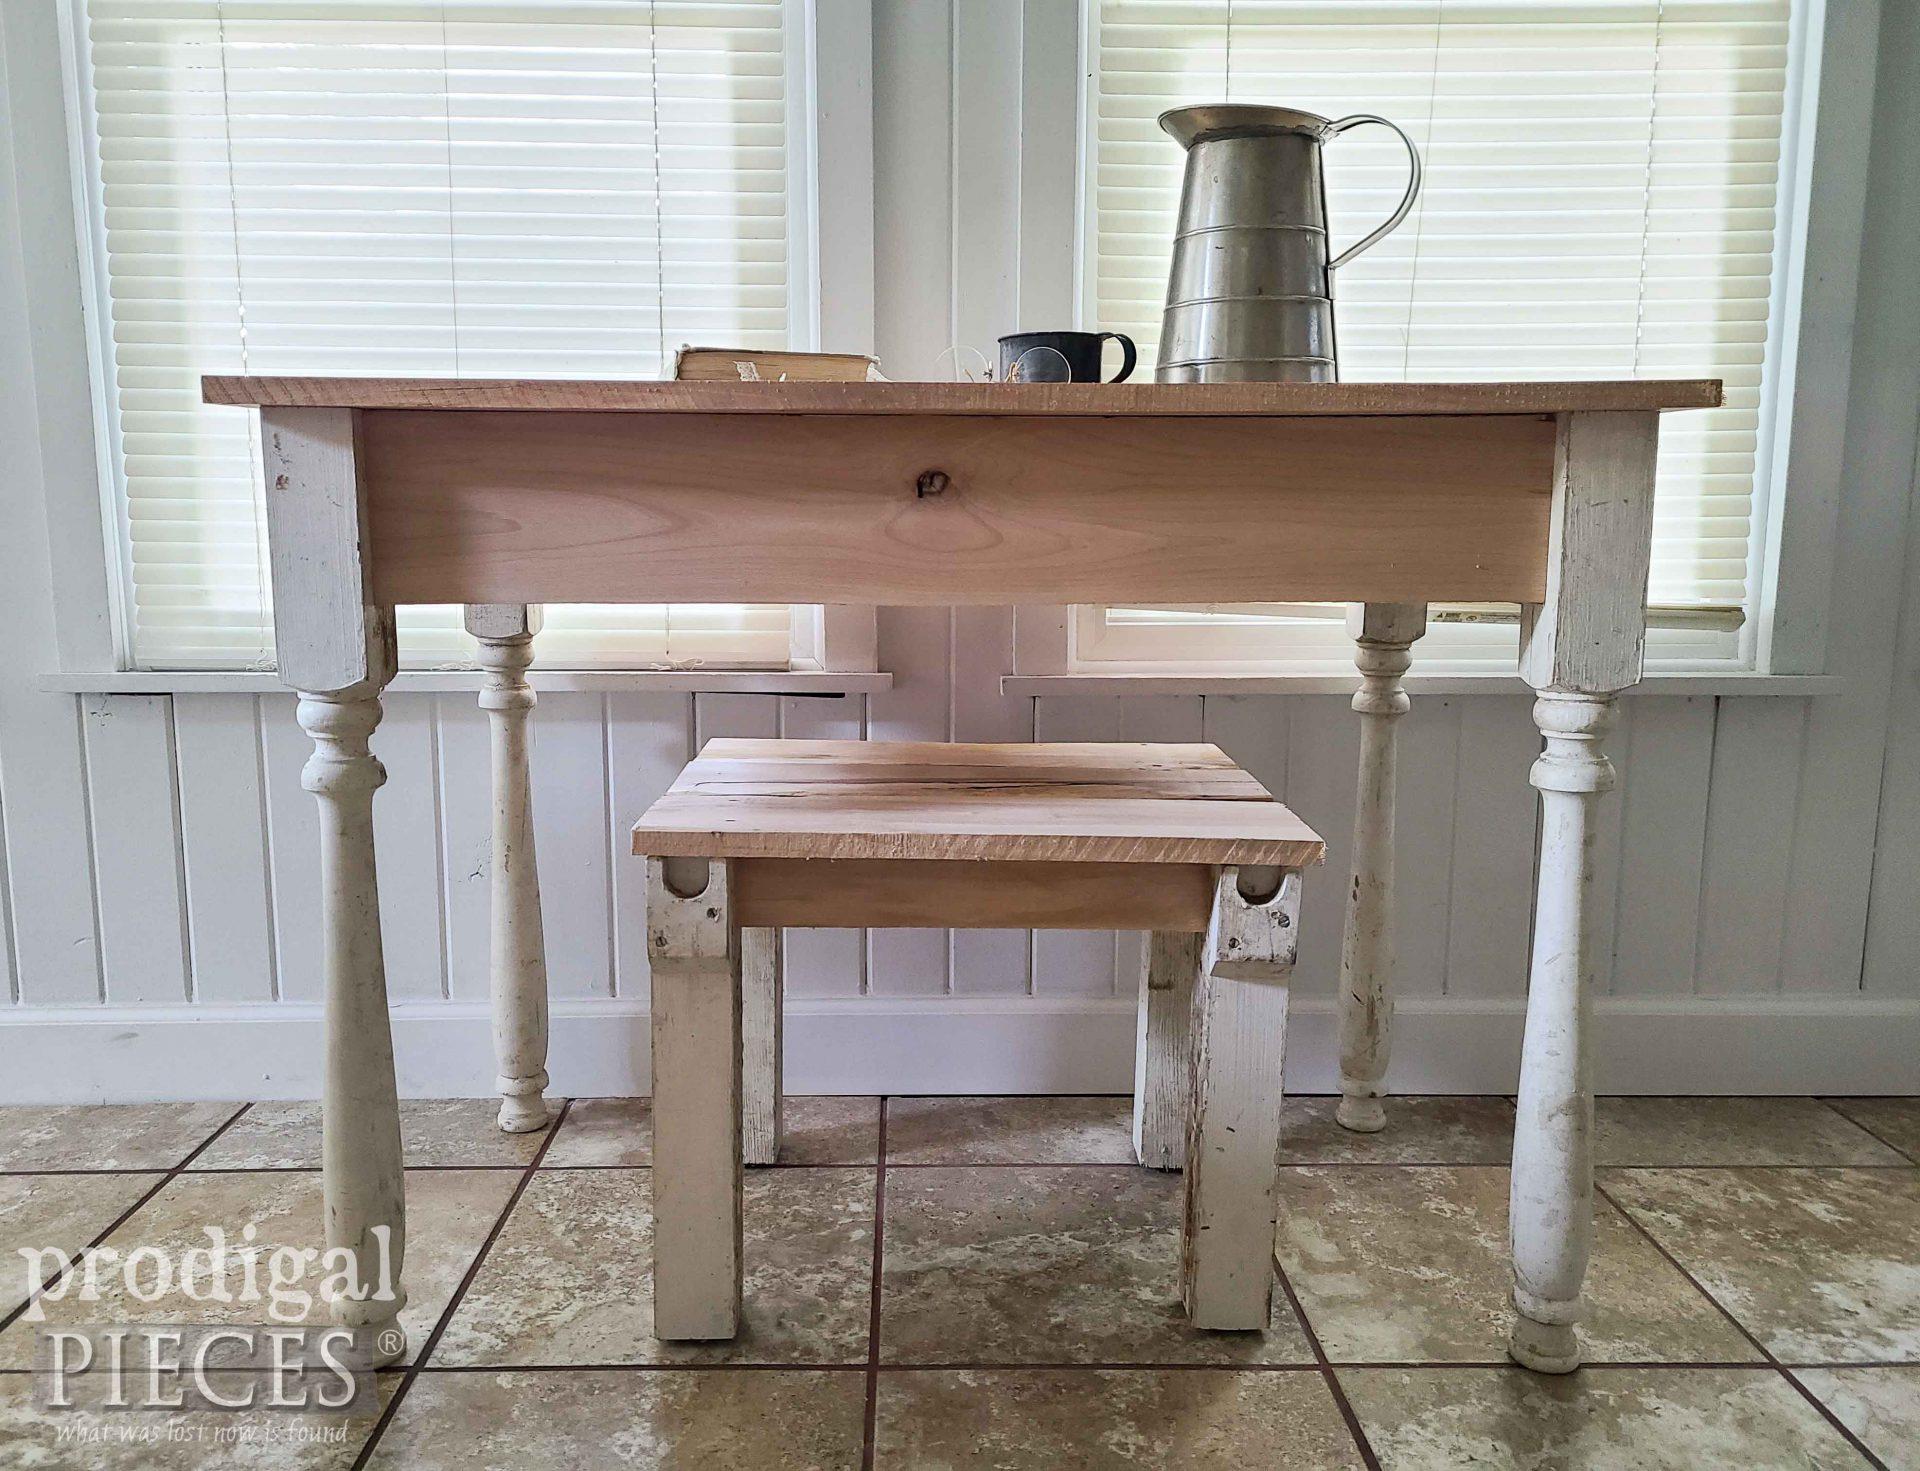 Rustic Desk Set Built with Reclaimed Wood by Larissa of Prodigal Pieces | prodigalpieces.com #prodigalpieces #furniture #desk #home